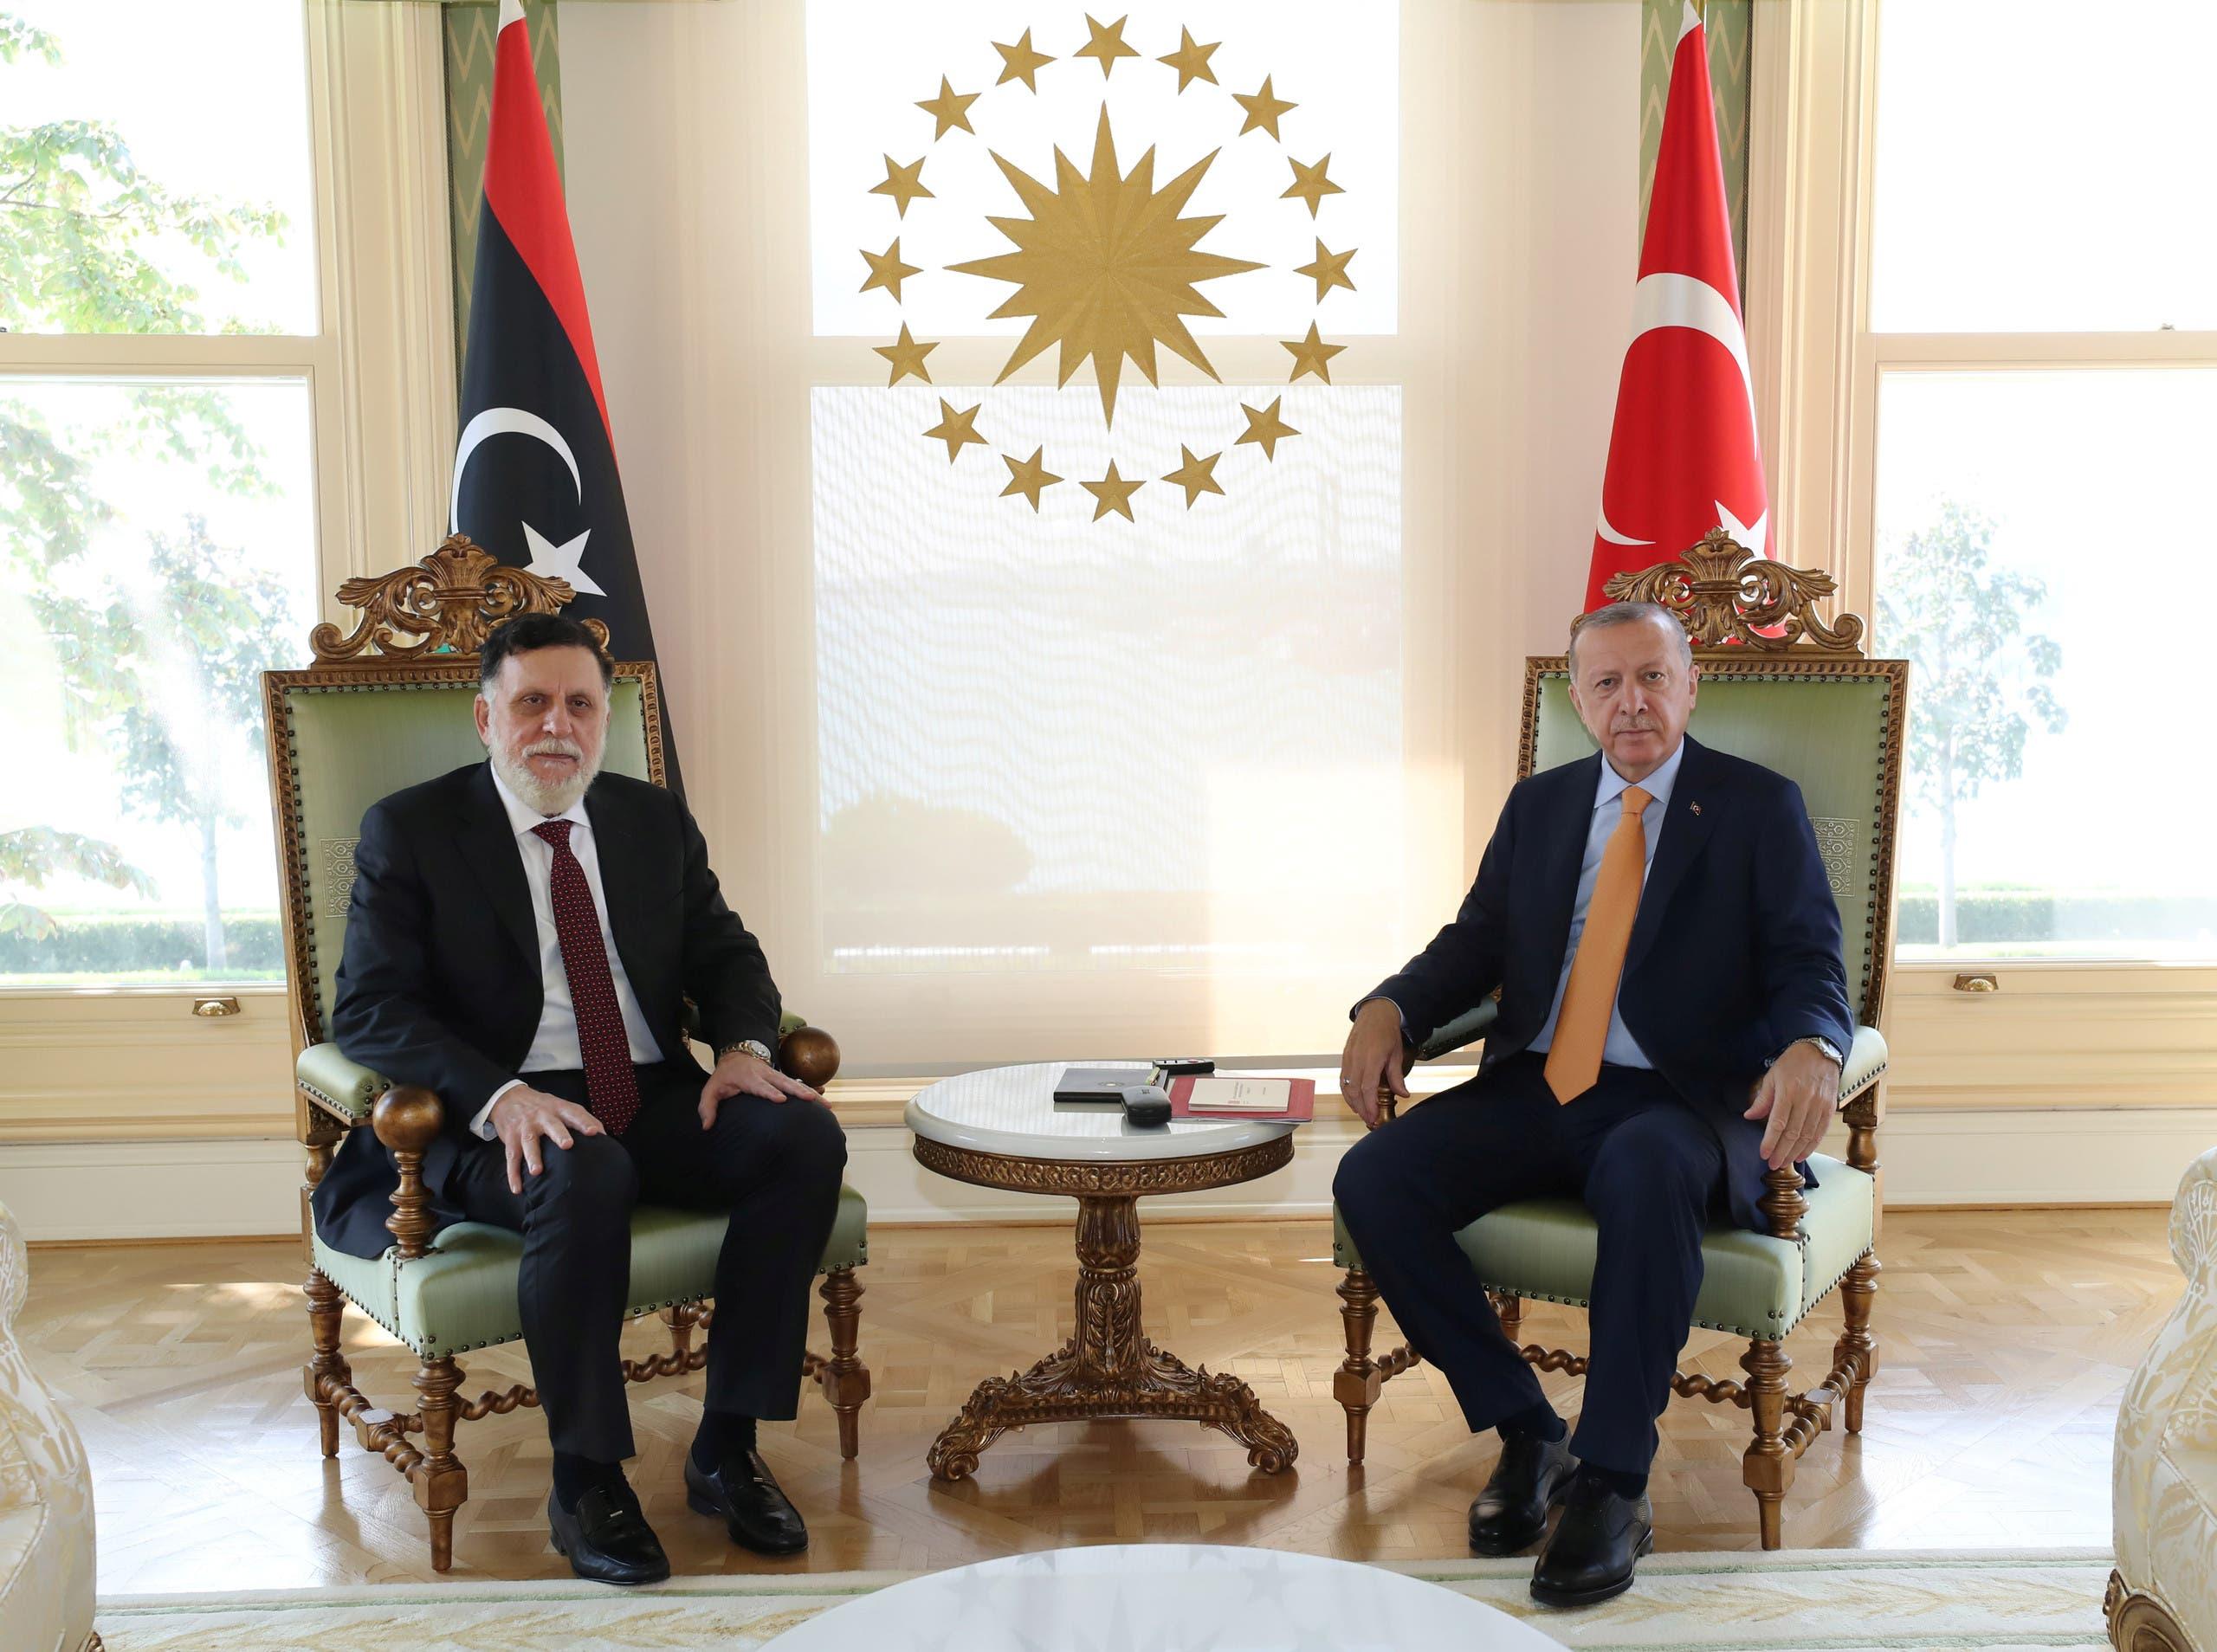 Turkey's President Tayyip Erdogan meets with Libya's internationally recognised Prime Minister Fayez al-Sarraj in Istanbul, Turkey, September 6, 2020. (Reuters)